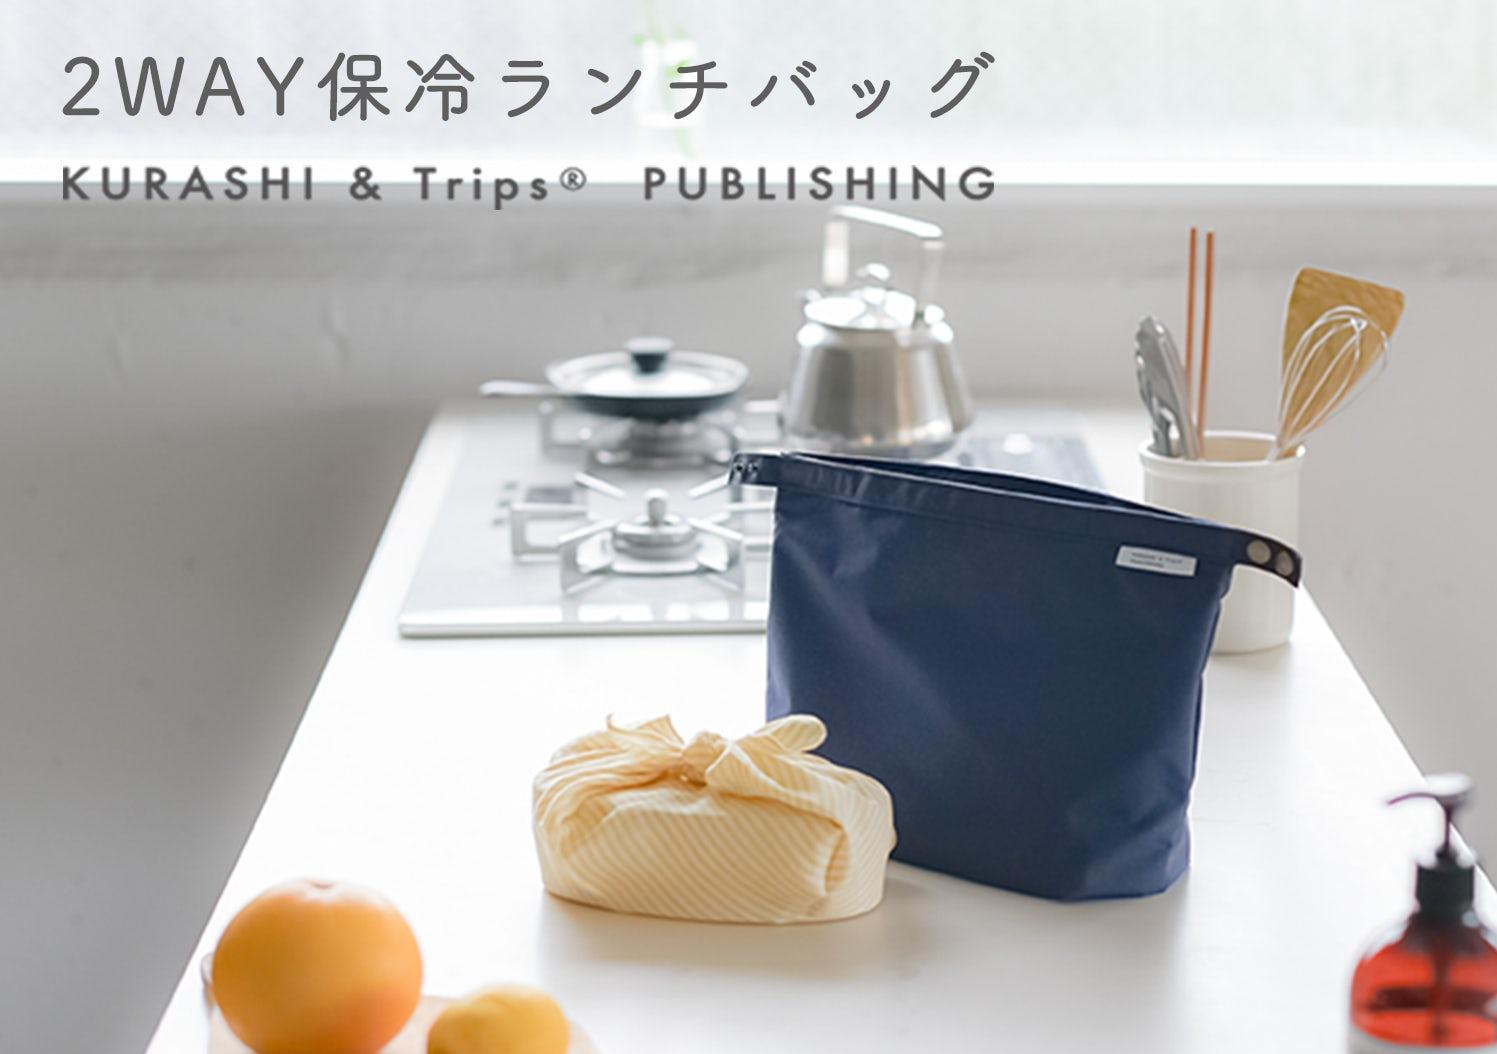 KURASHI&Trips PUBLISHING / 2WAY保冷ランチバッグの画像